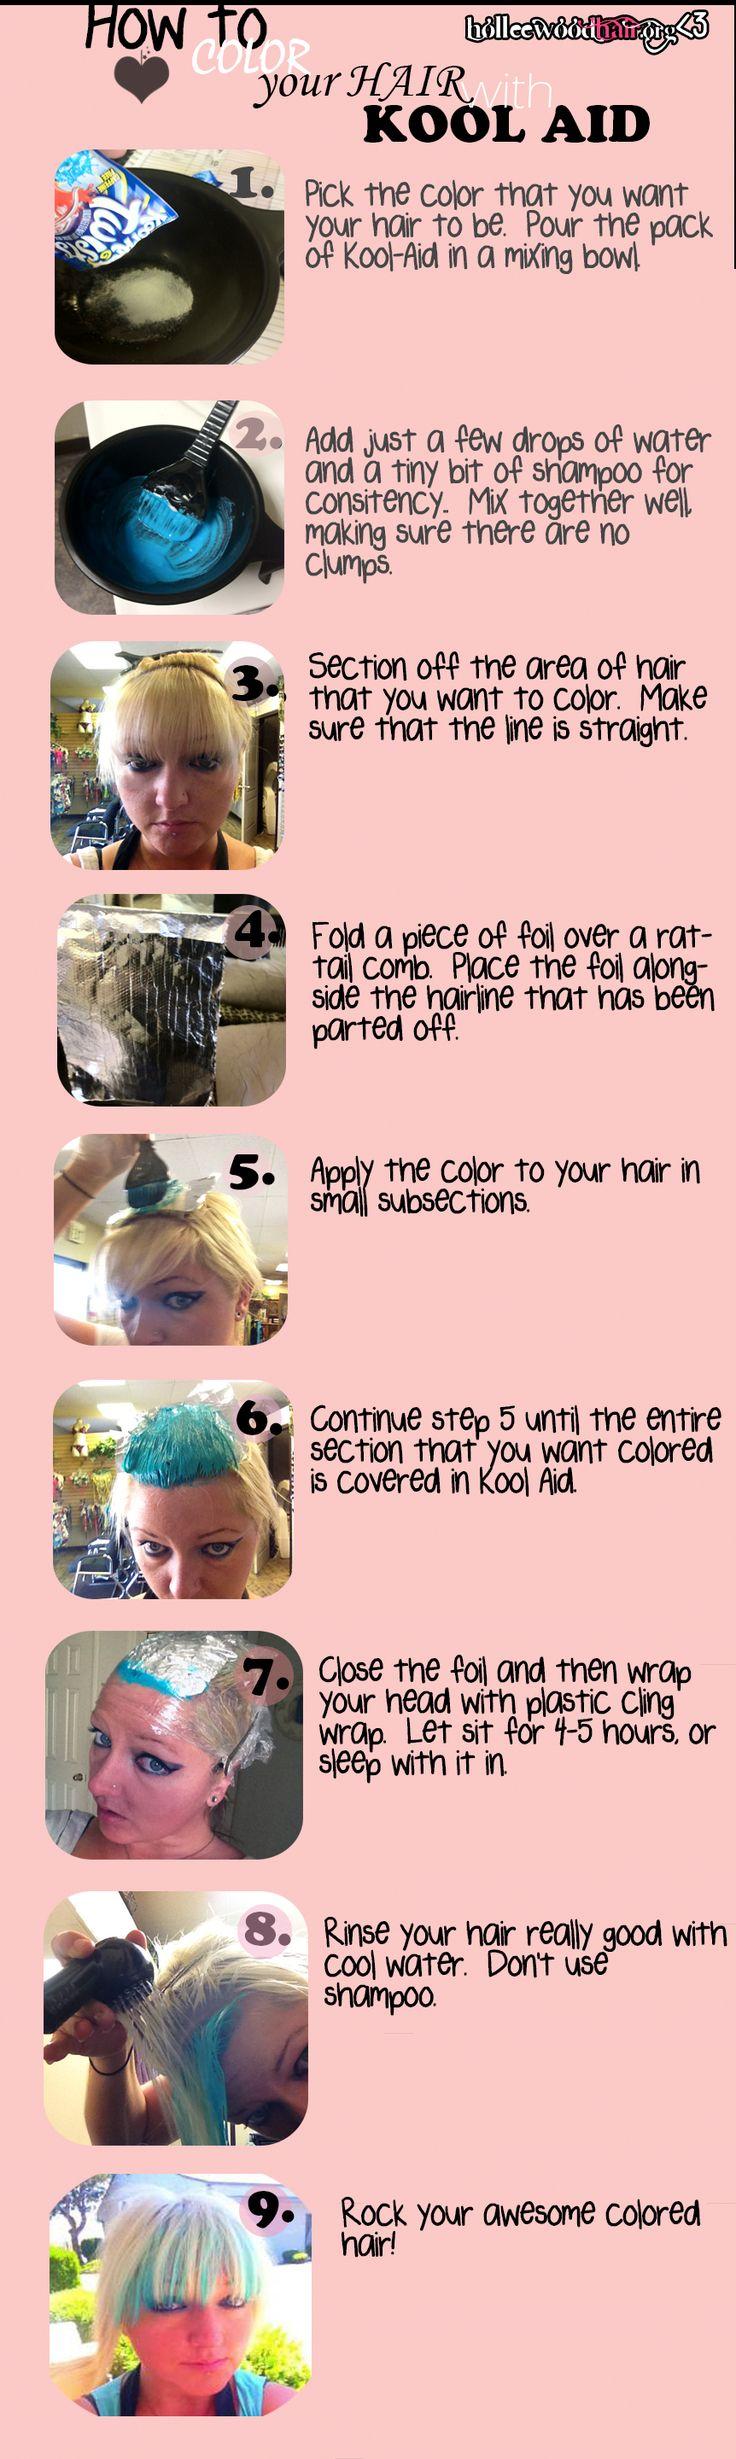 DIY Kool-Aid Hair Color